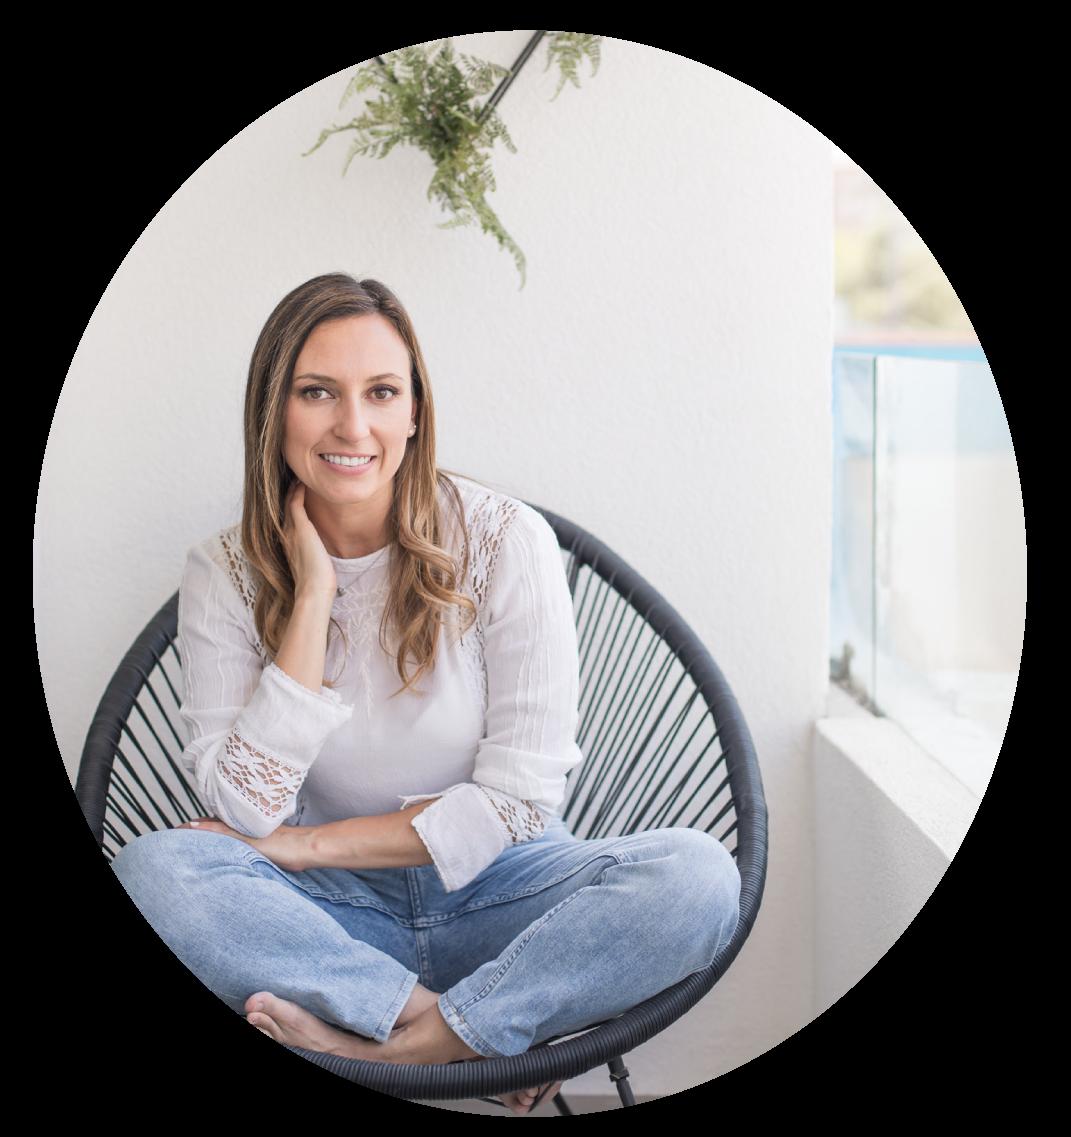 mindset-coach-for-women-entrepreneurs-daniela-sani.png